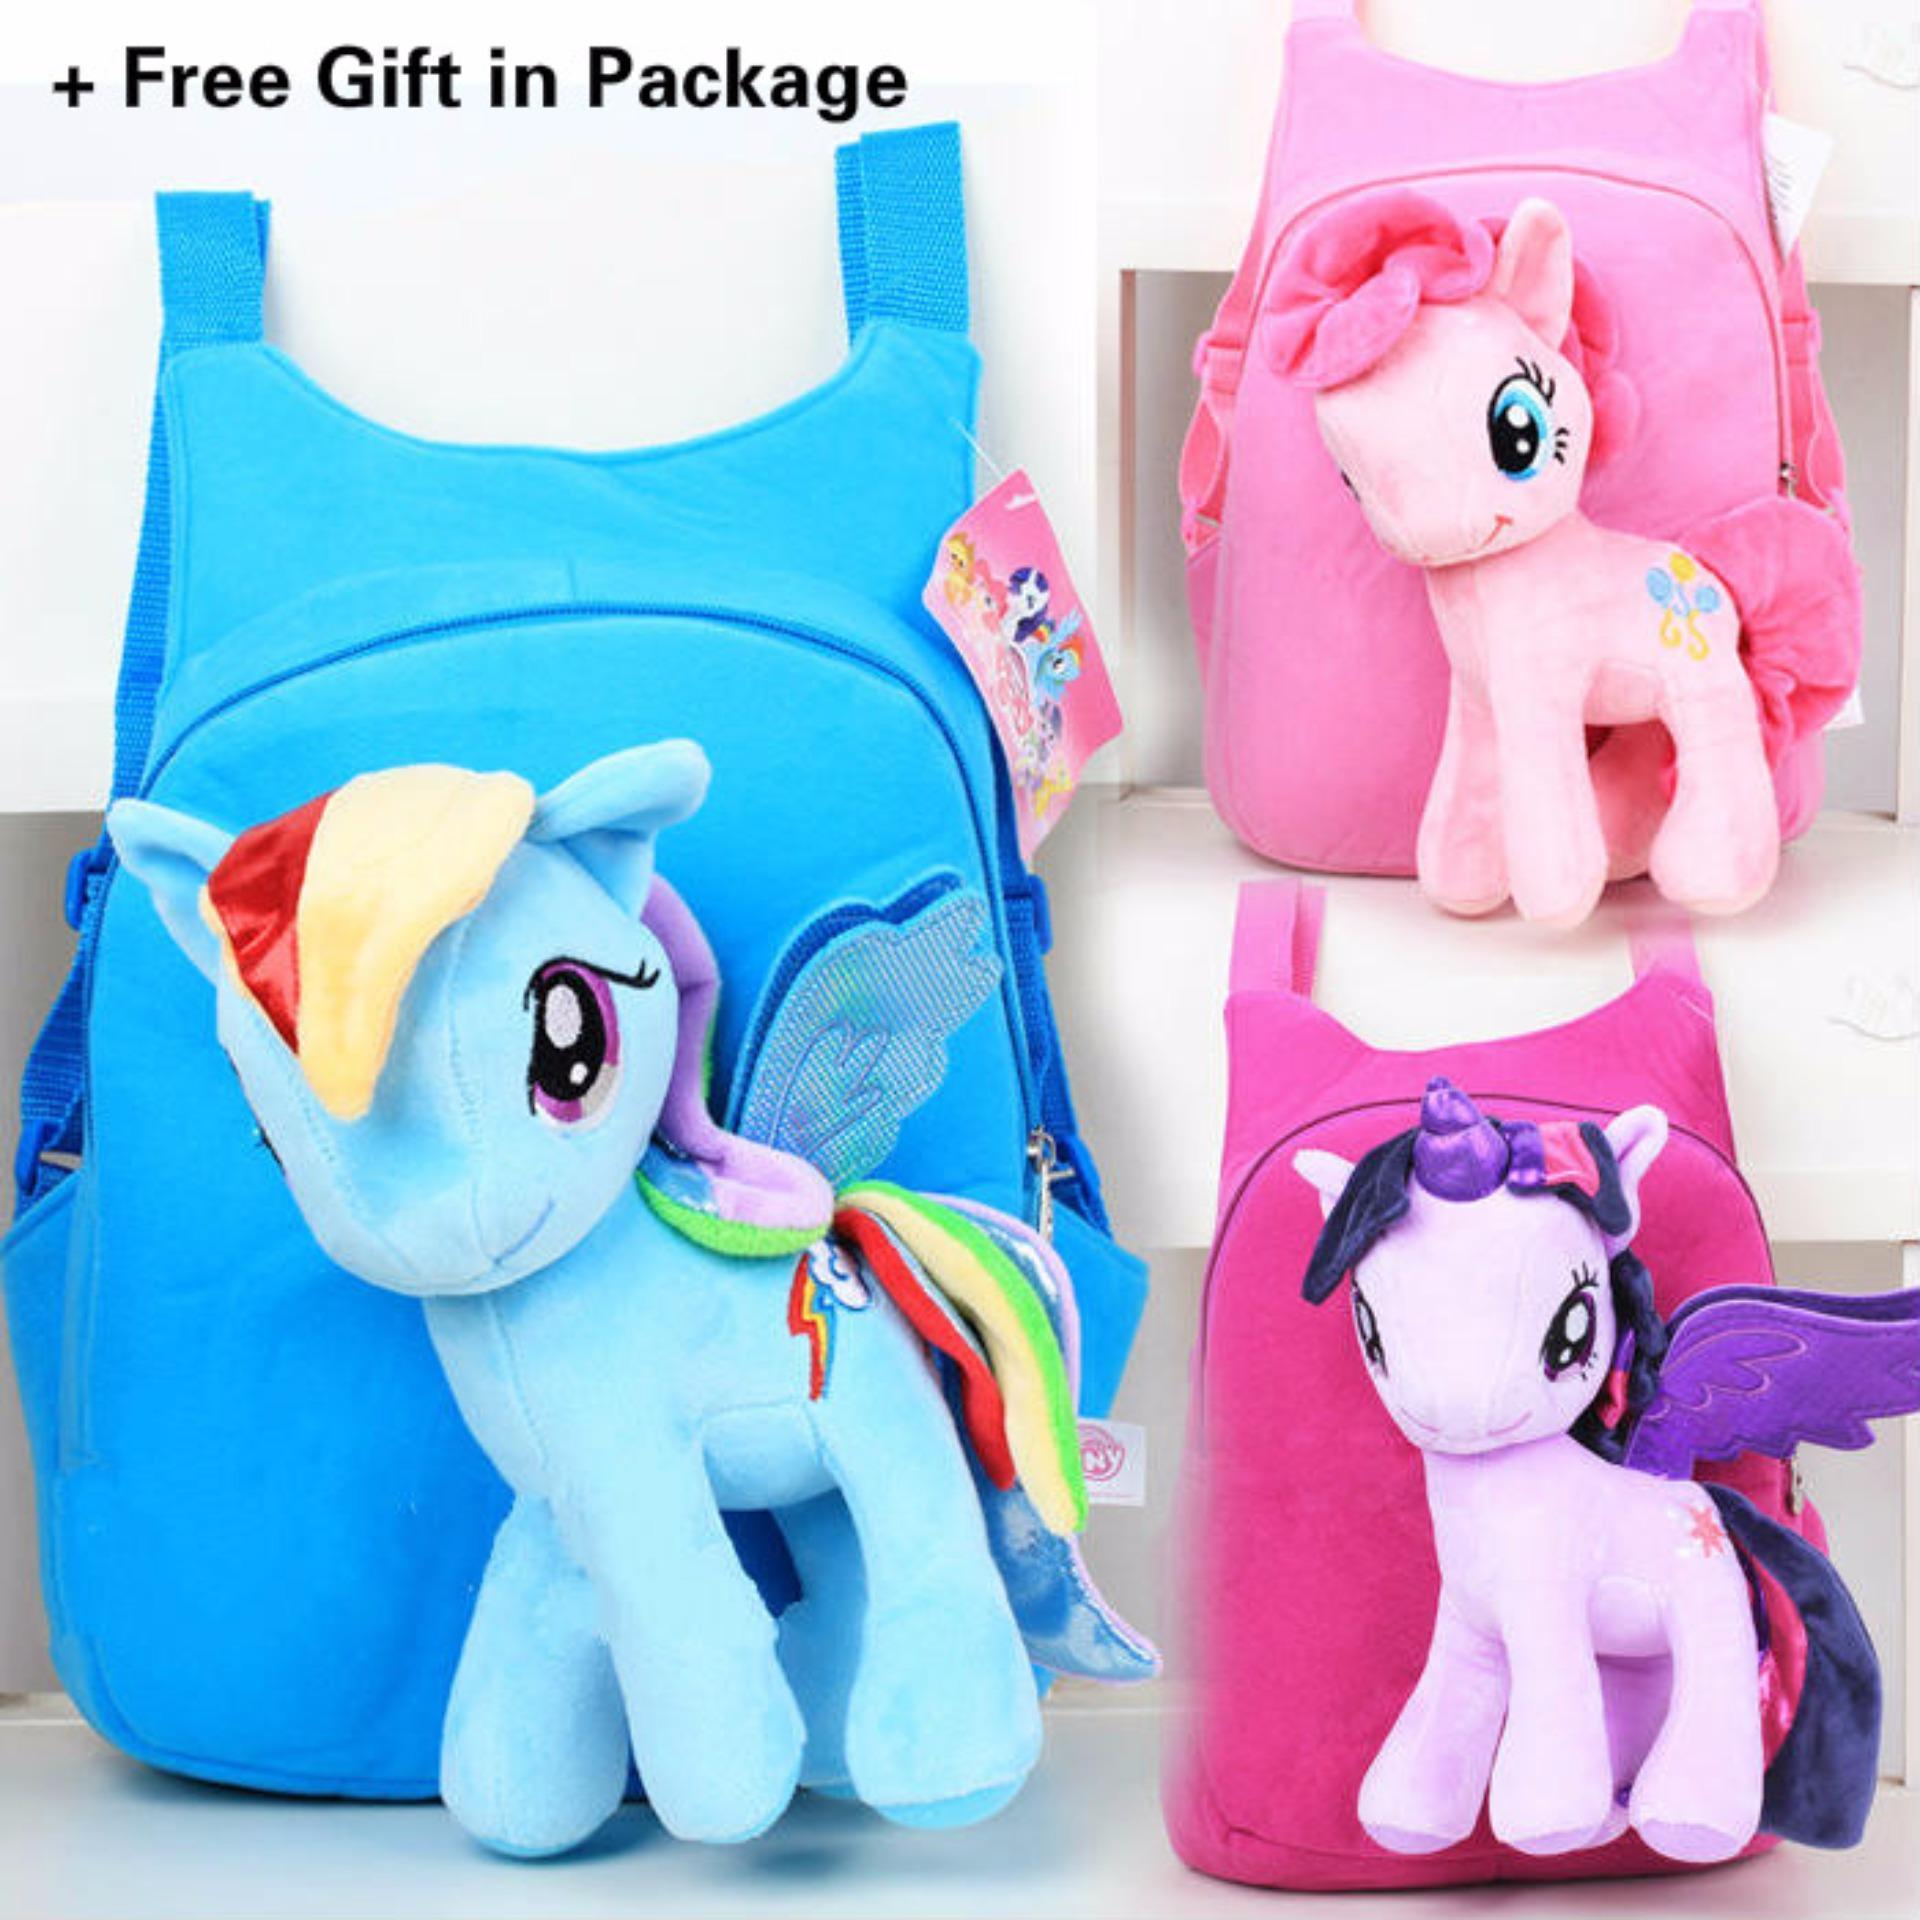 Kisnow 2 in 1 Kids Baby Super Soft Unicorn Plush Horse + School Travel Shoulder Bag Backpacks(Color:Purple) - intl